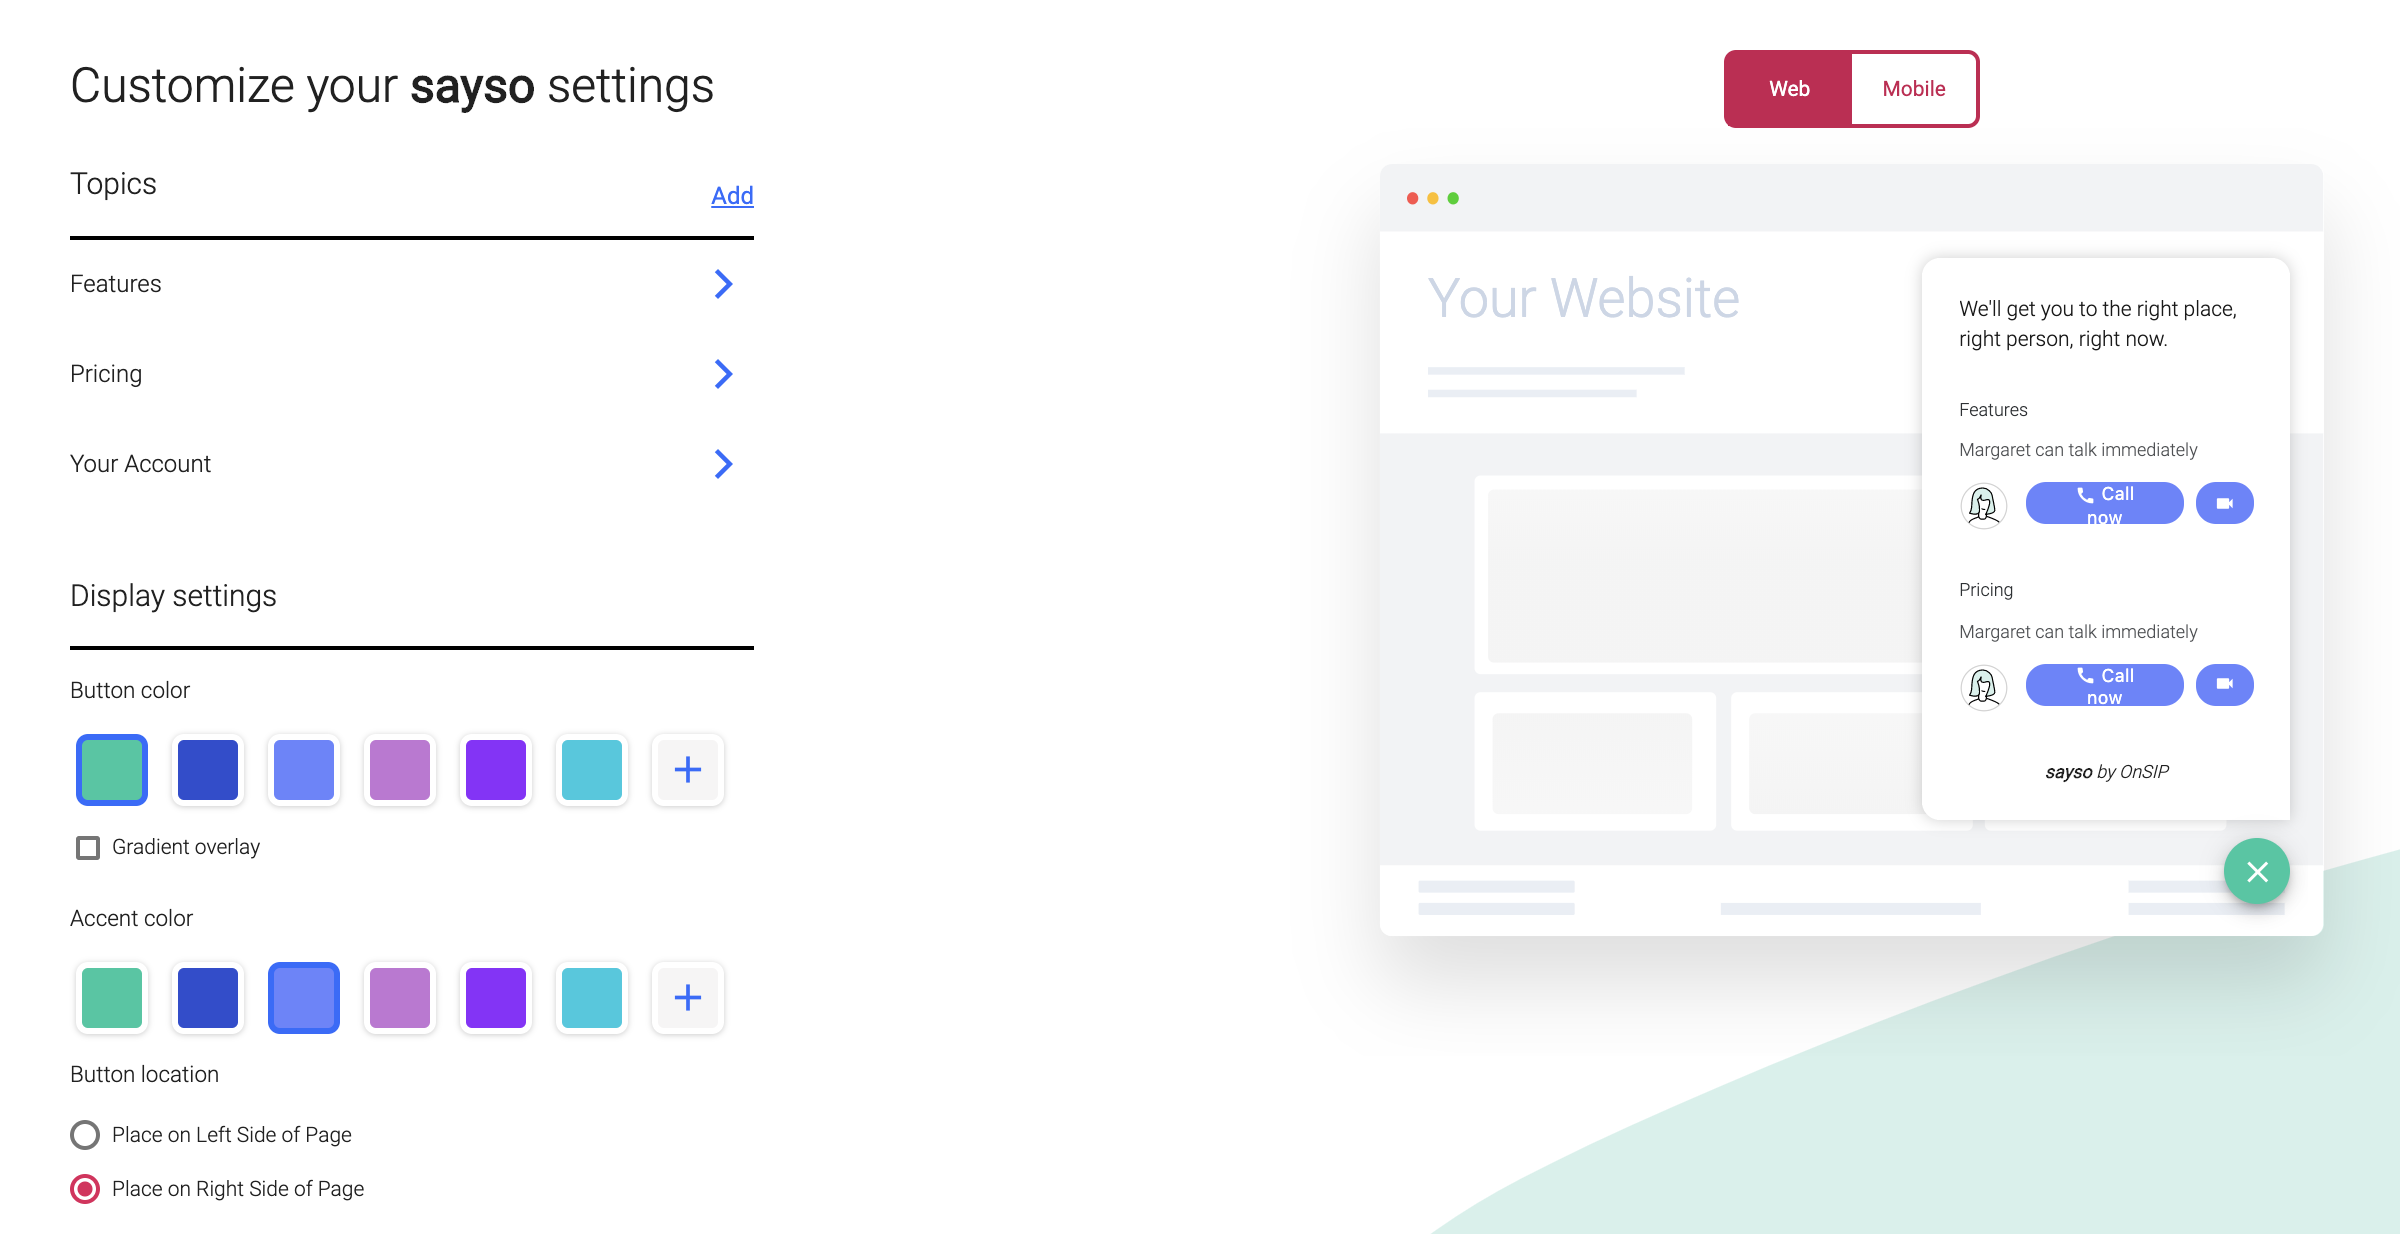 sayso settings screenshot showing customization options.